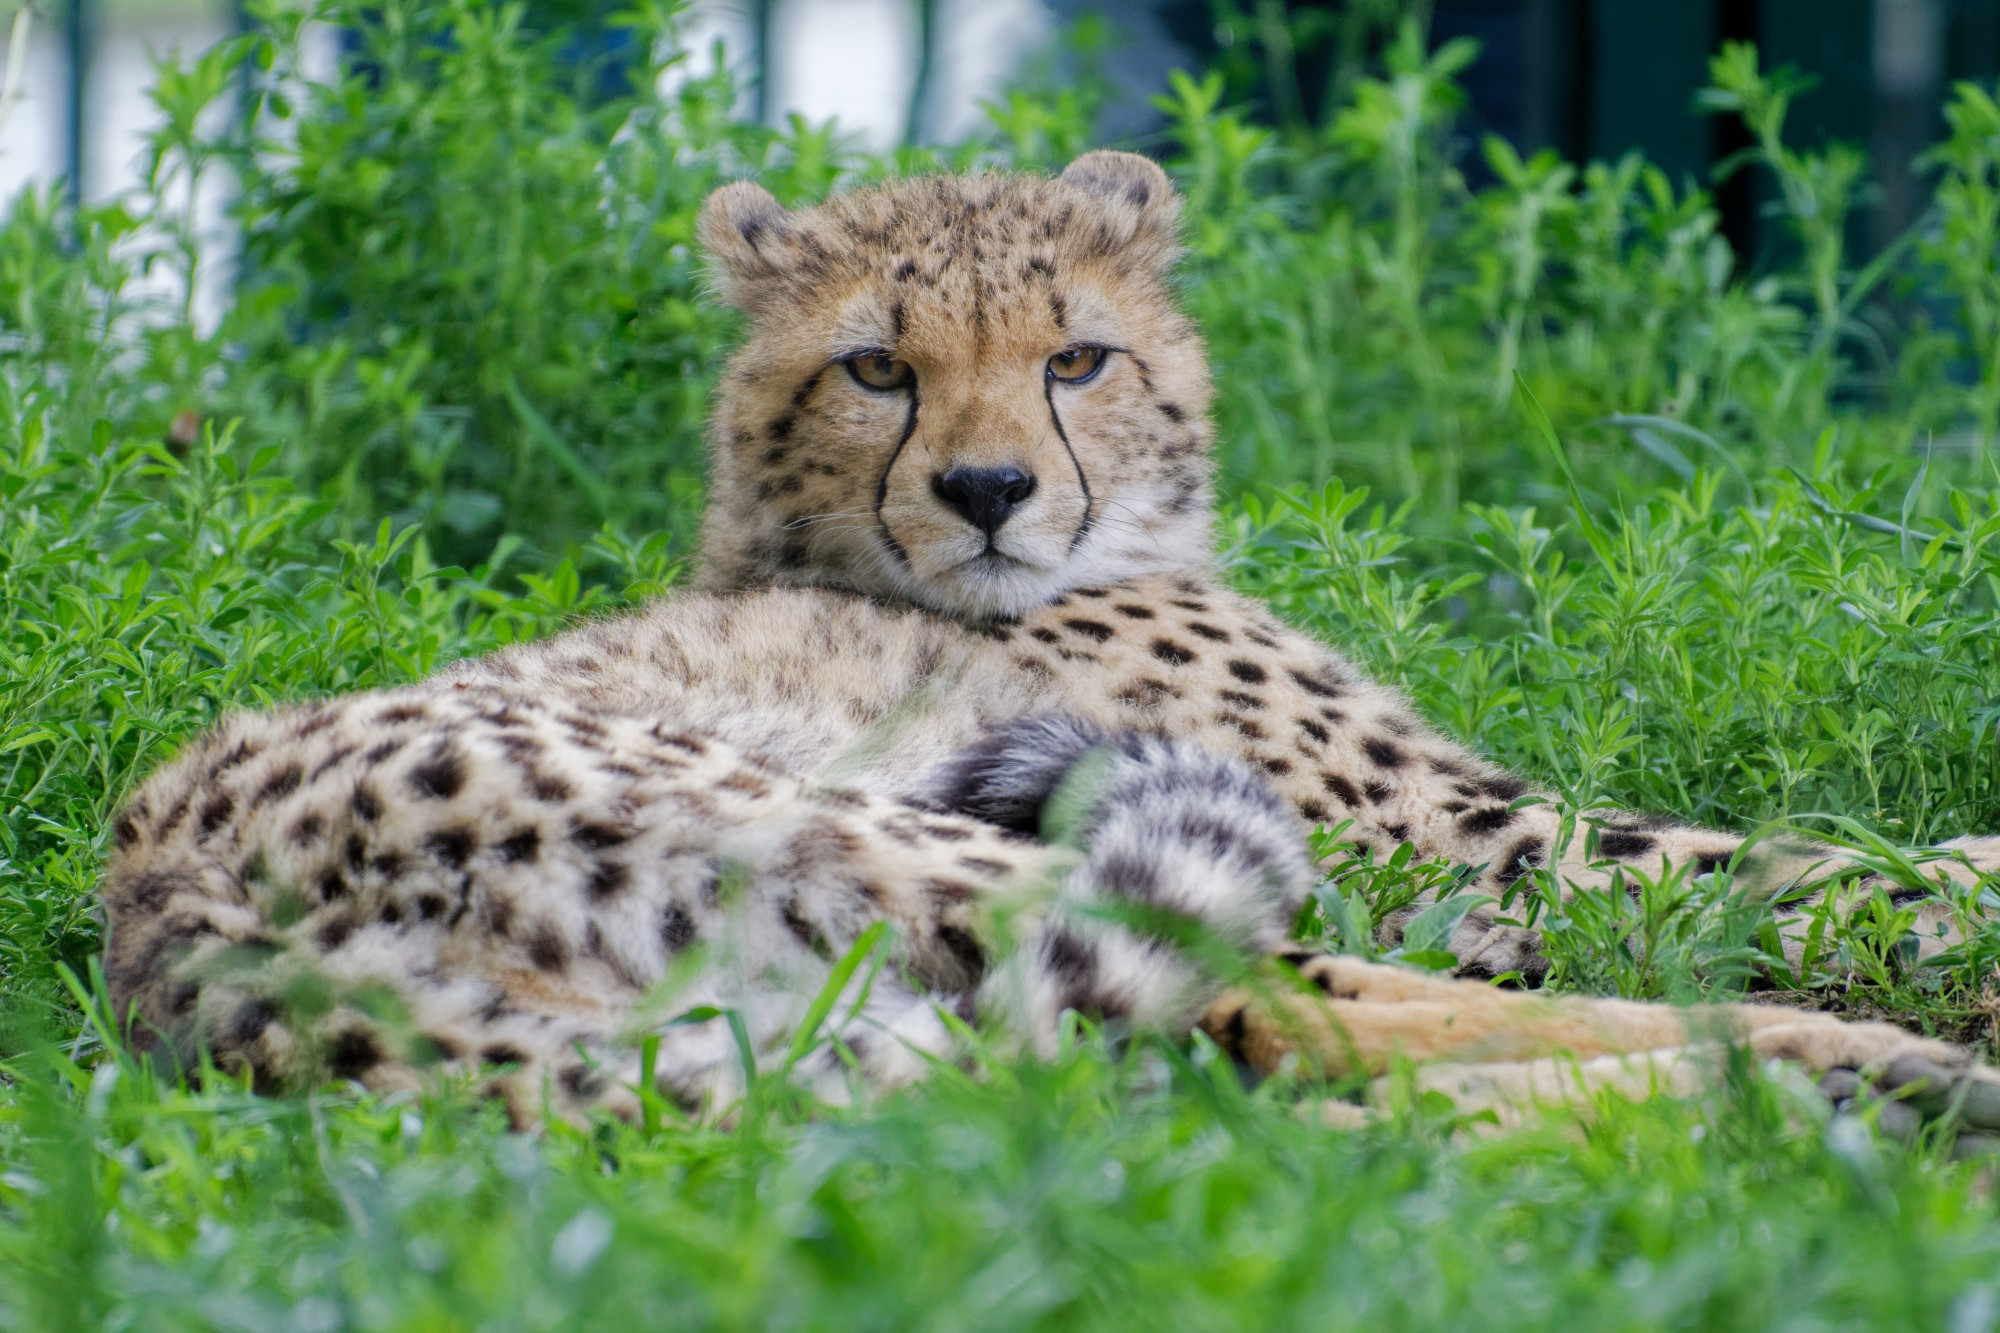 gepard im gras 2021-05-23